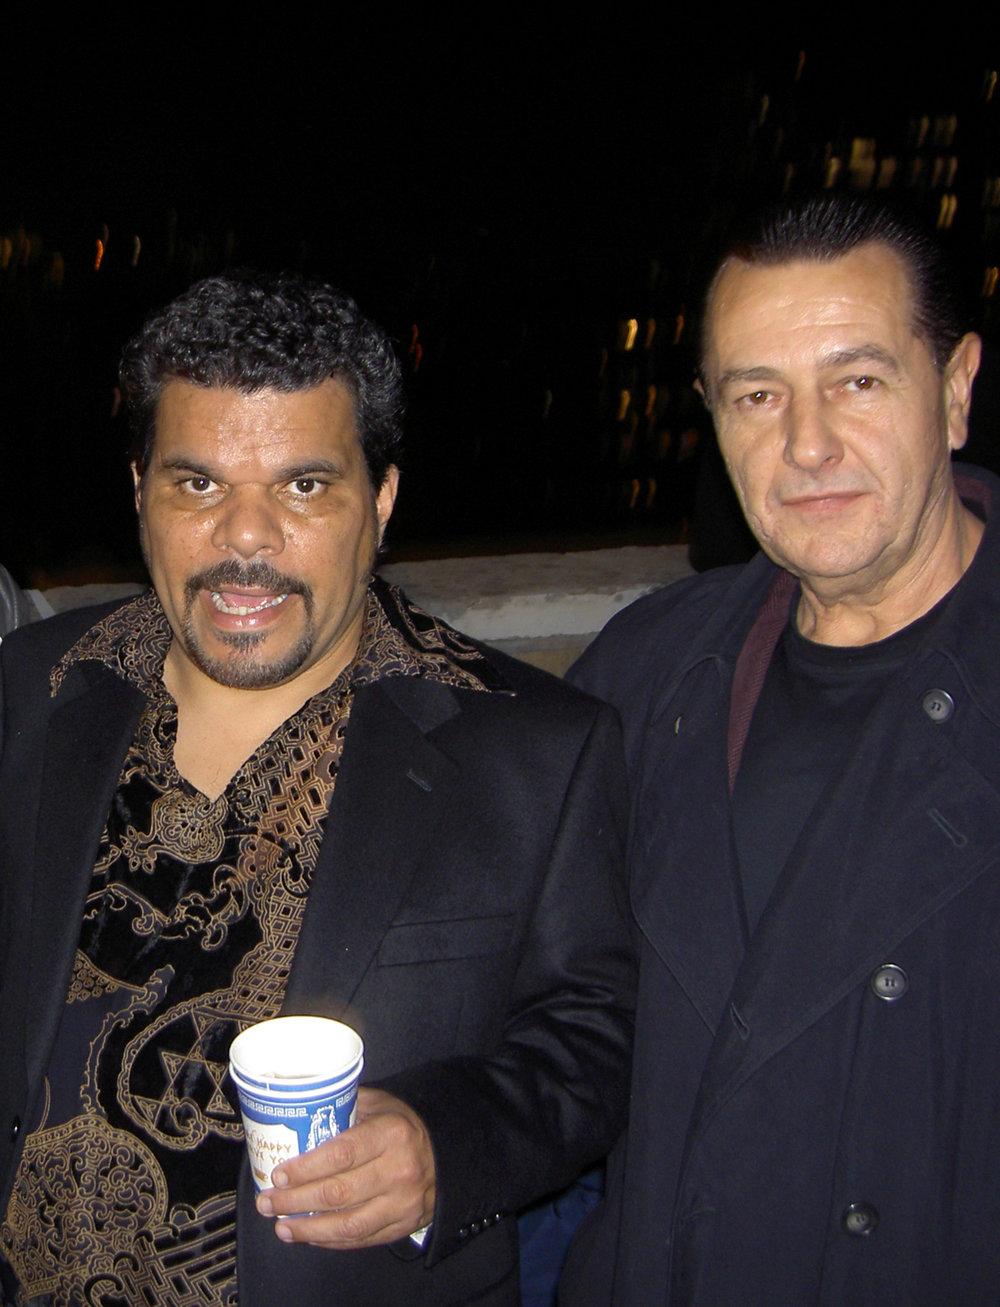 Luis Guzman and Vladimir Nazarov